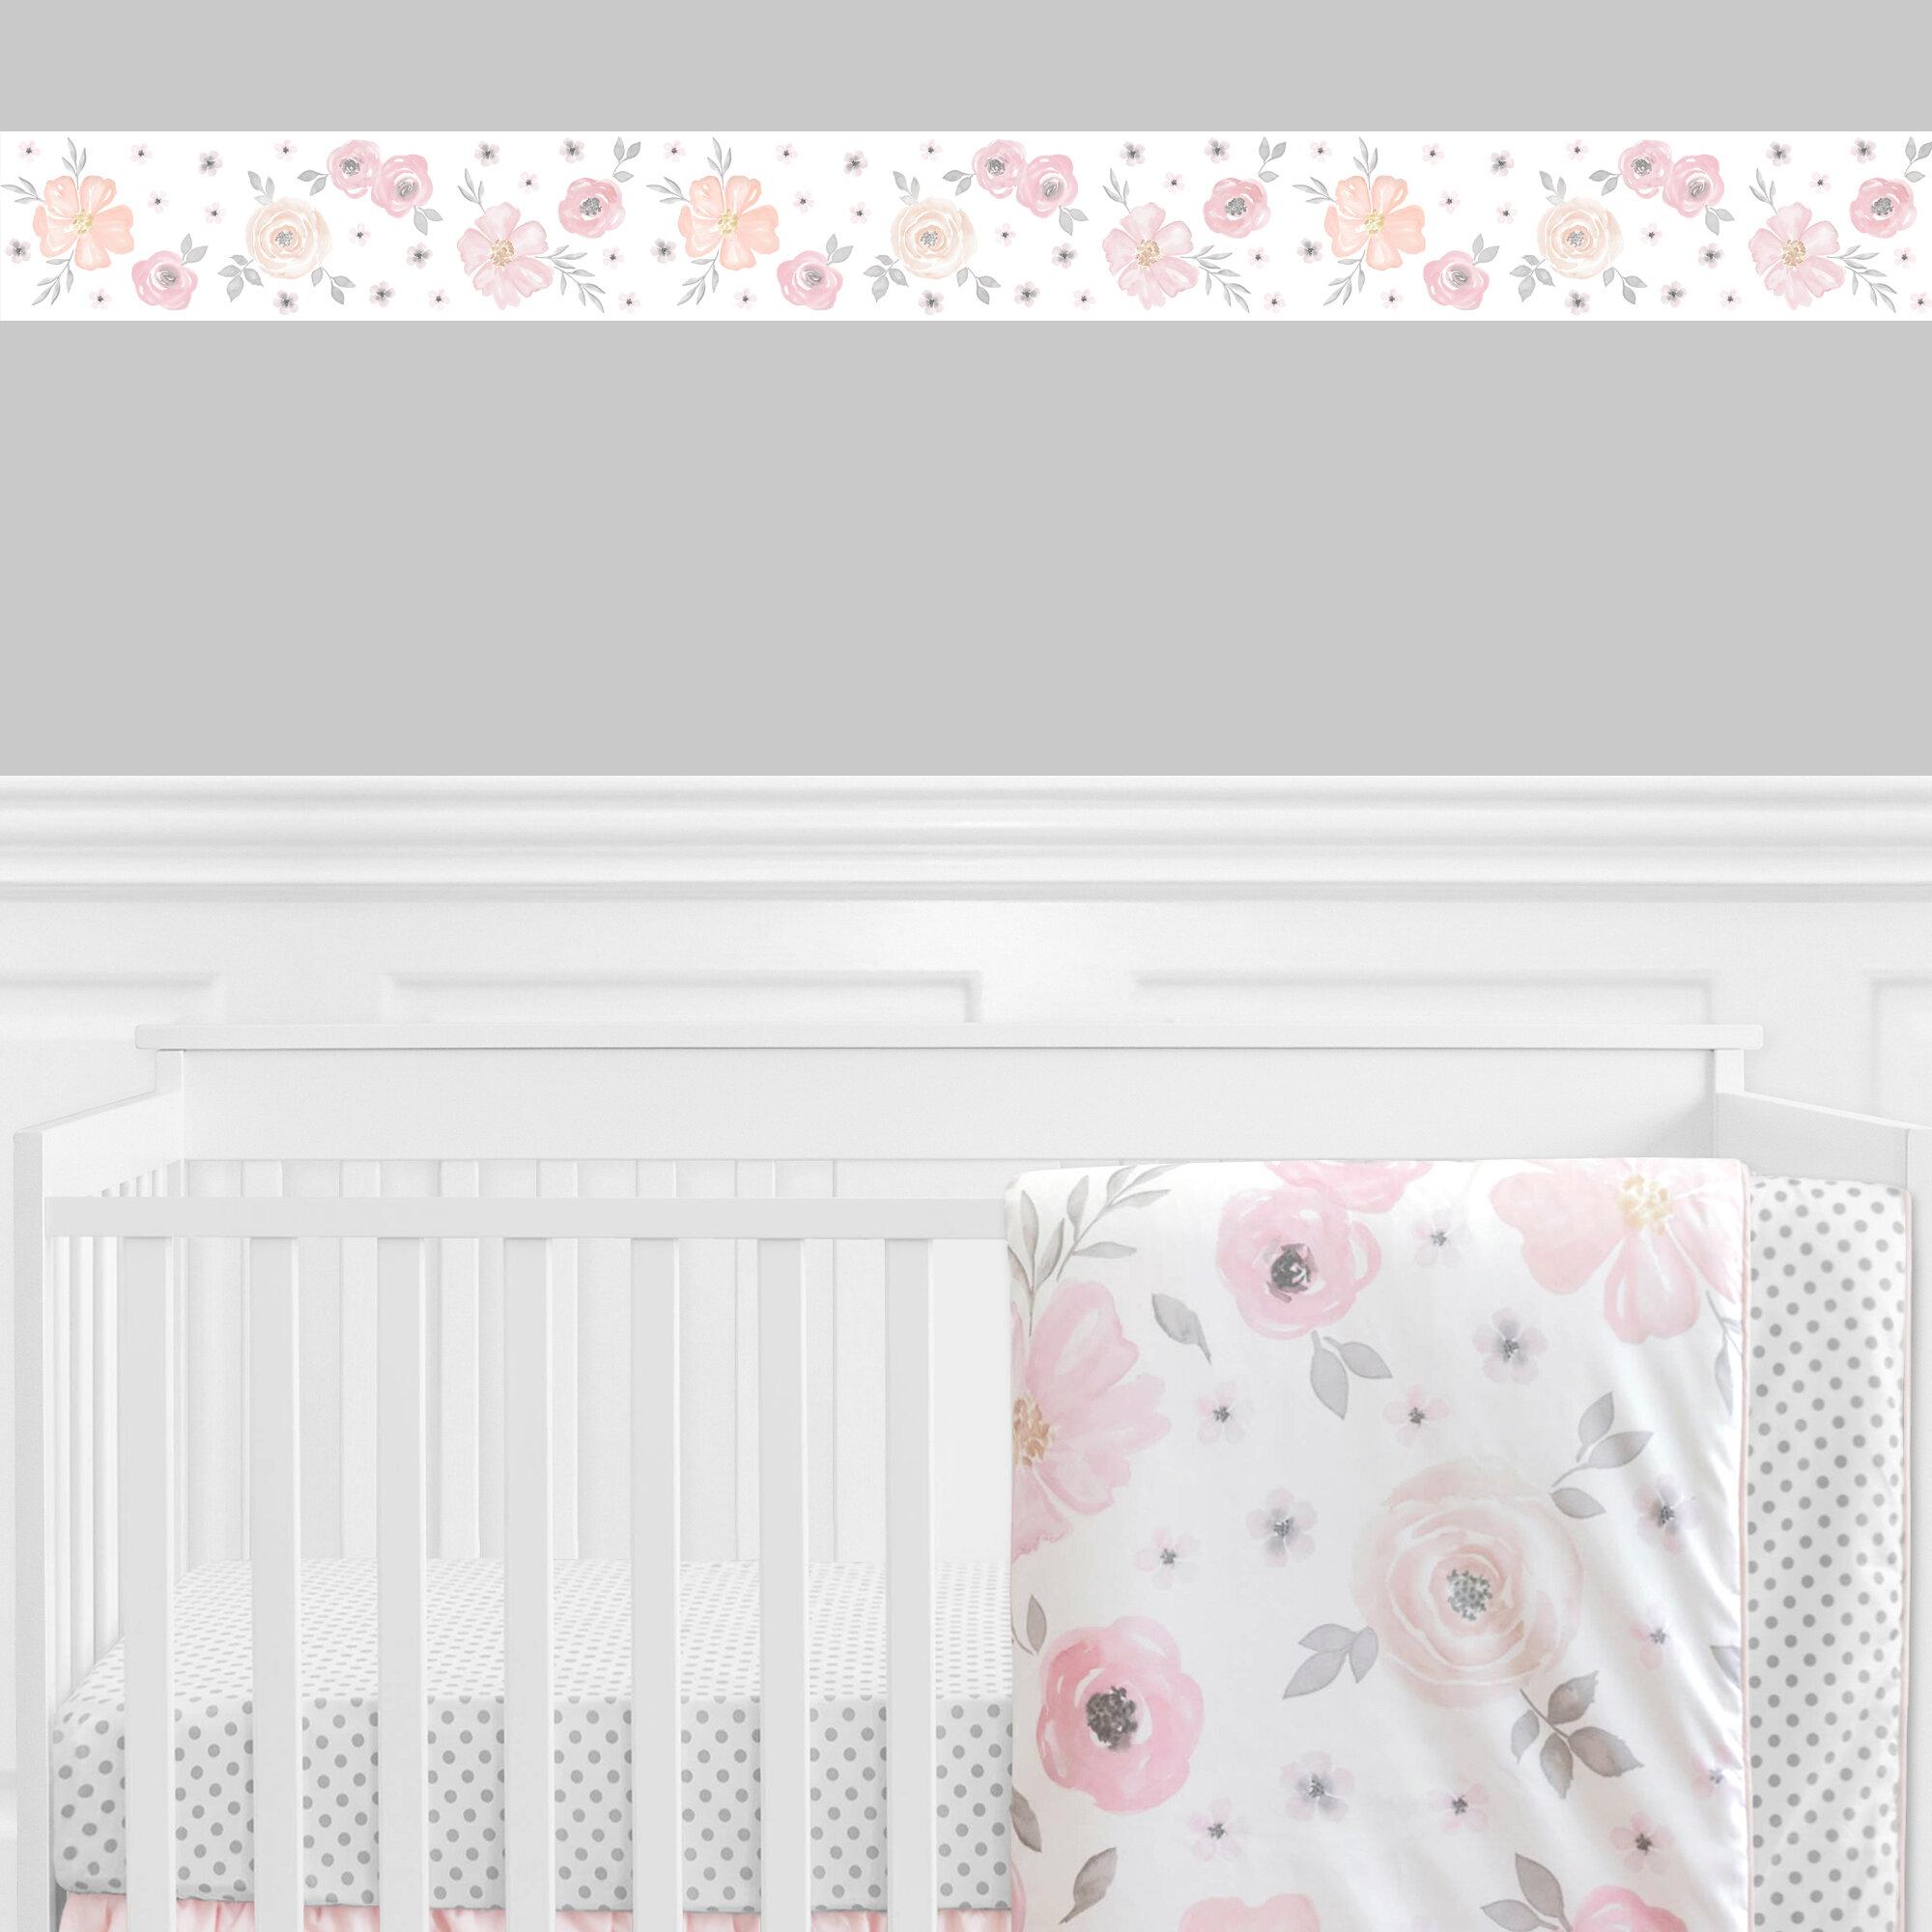 Sweet Jojo Designs Watercolor Floral 15 L X 6 W Smooth Wallpaper